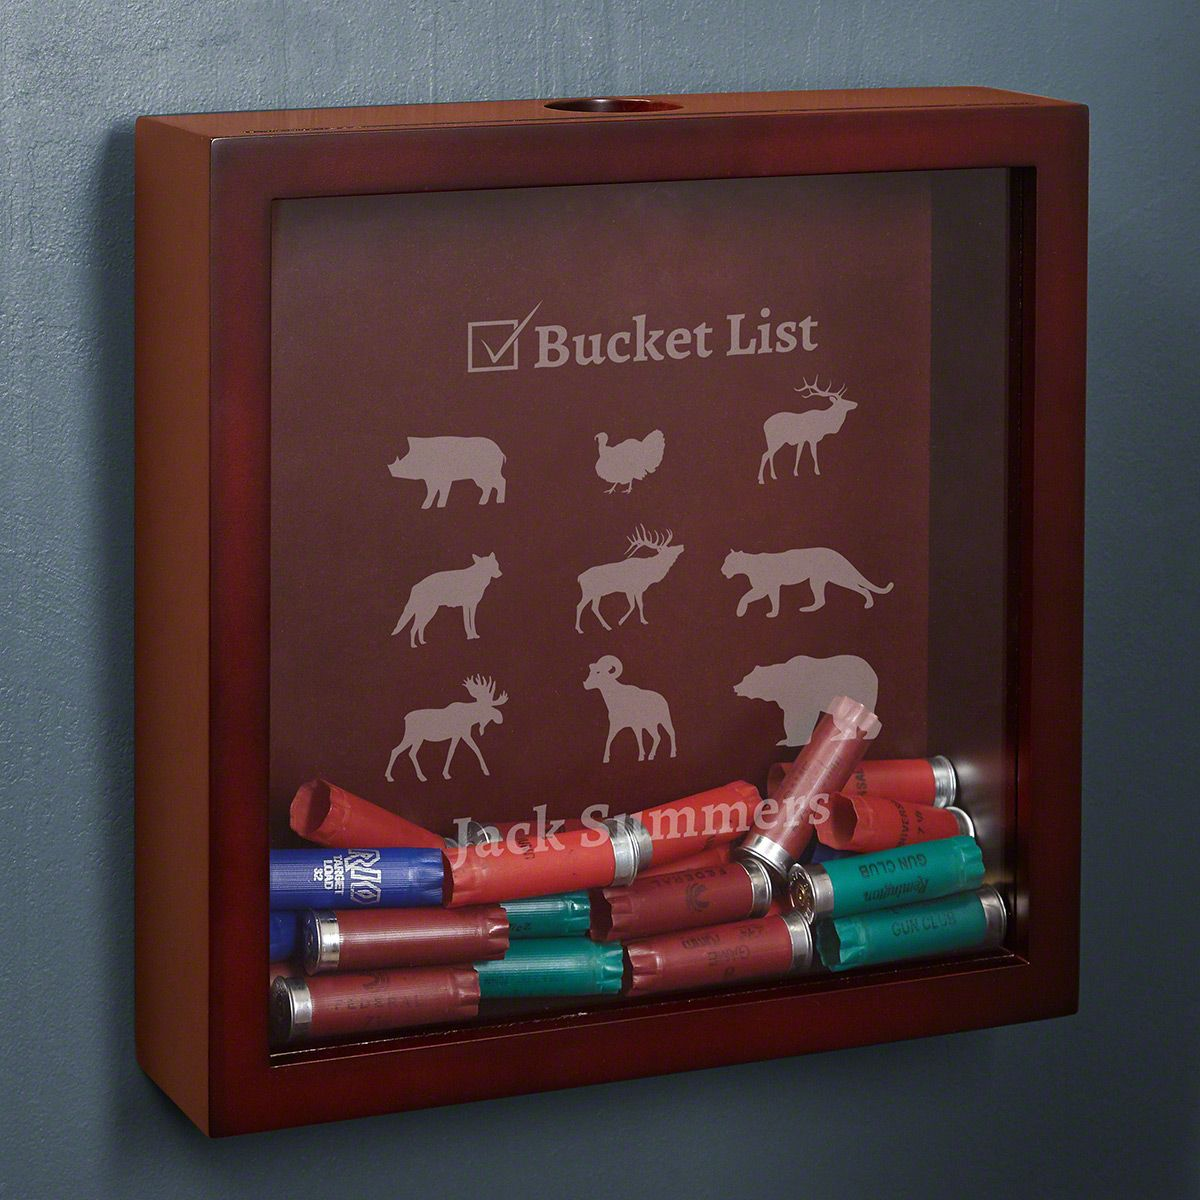 Bucket List Custom Shadow Box for Hunters